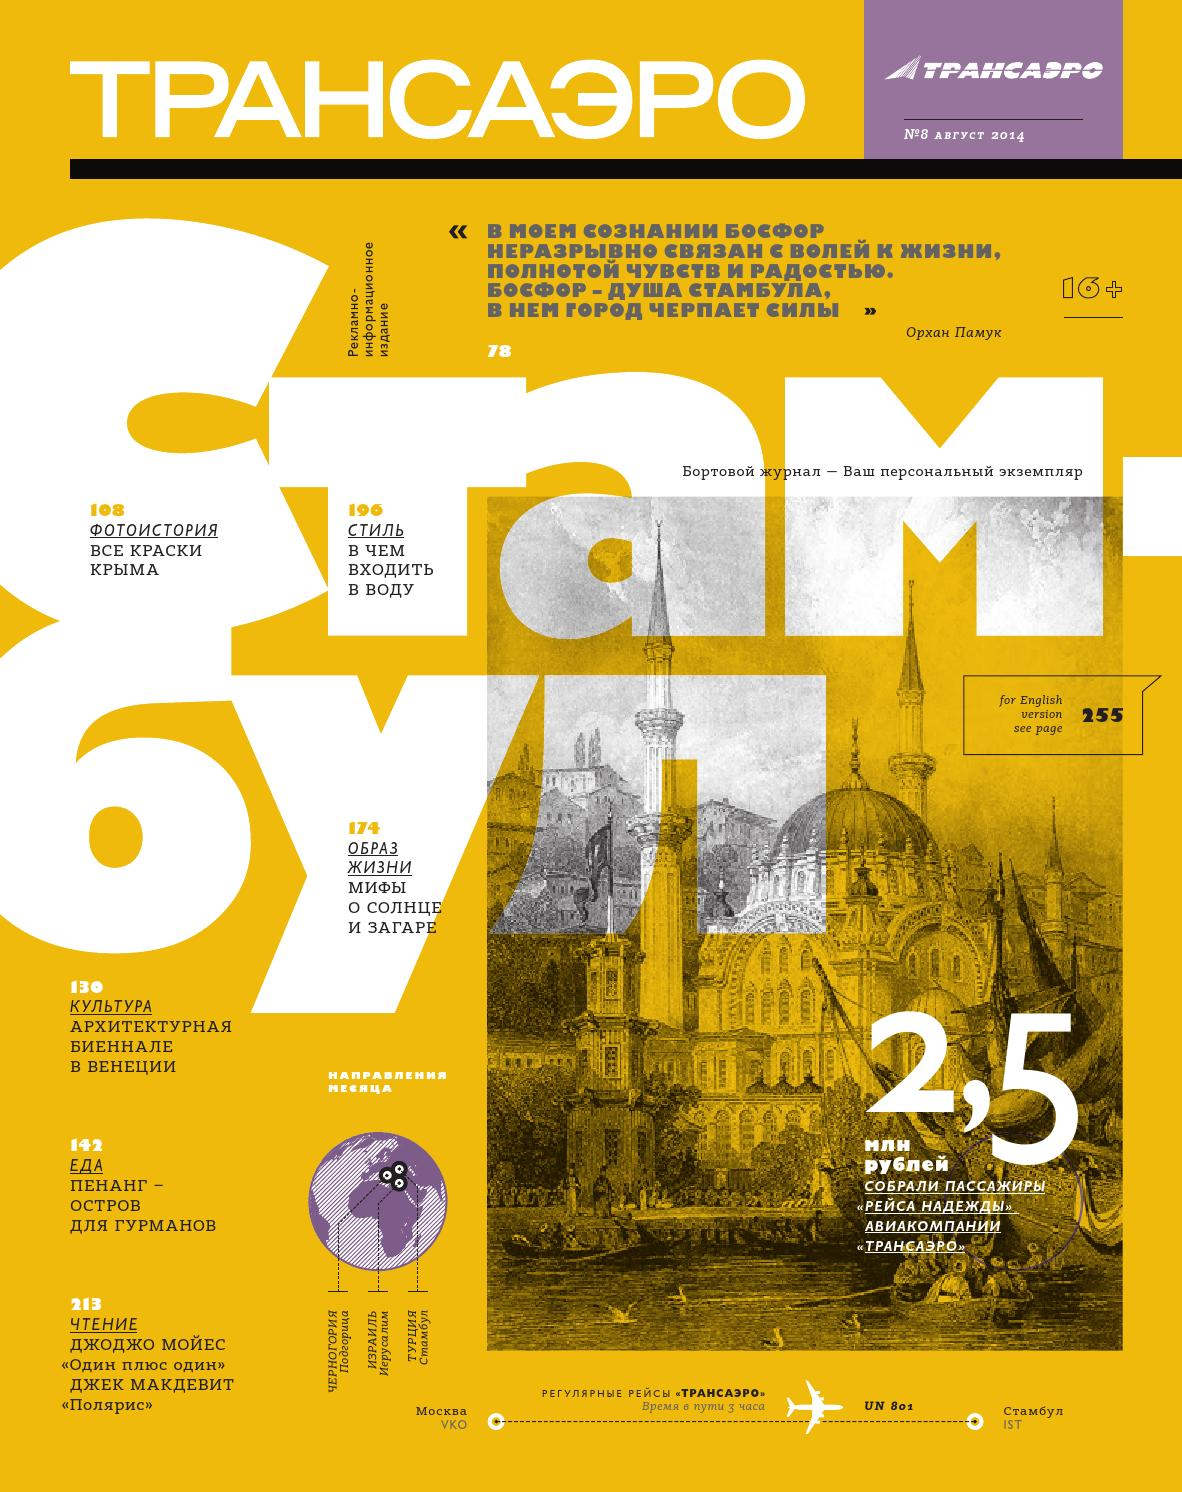 Transaero Magazine  08 2014 by TA Magazine - issuu 8d0d6745583